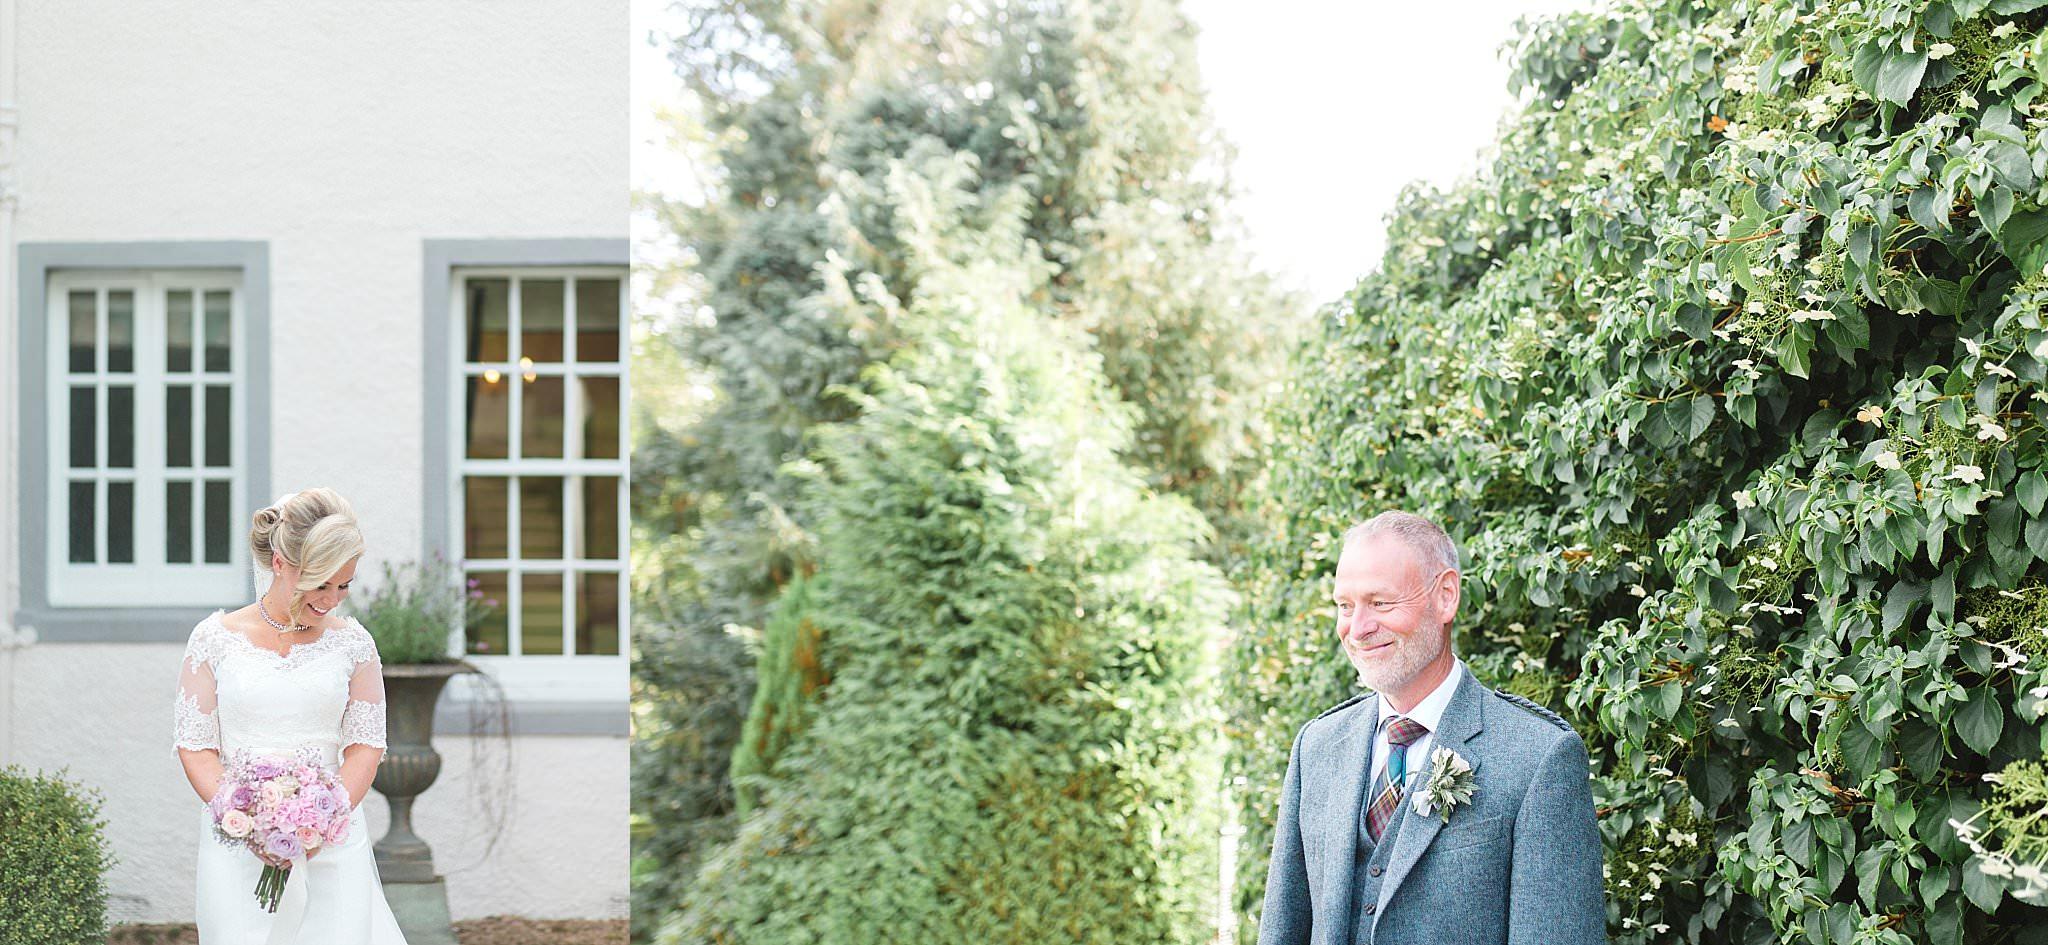 Elsick House Wedding,Fine Art Wedding Photographers,The Gibsons,elegant wedding photographers glasgow,husband and wife photographers scotland,natural wedding photographers,romantic photographers Scotland,romantic wedding photographers,